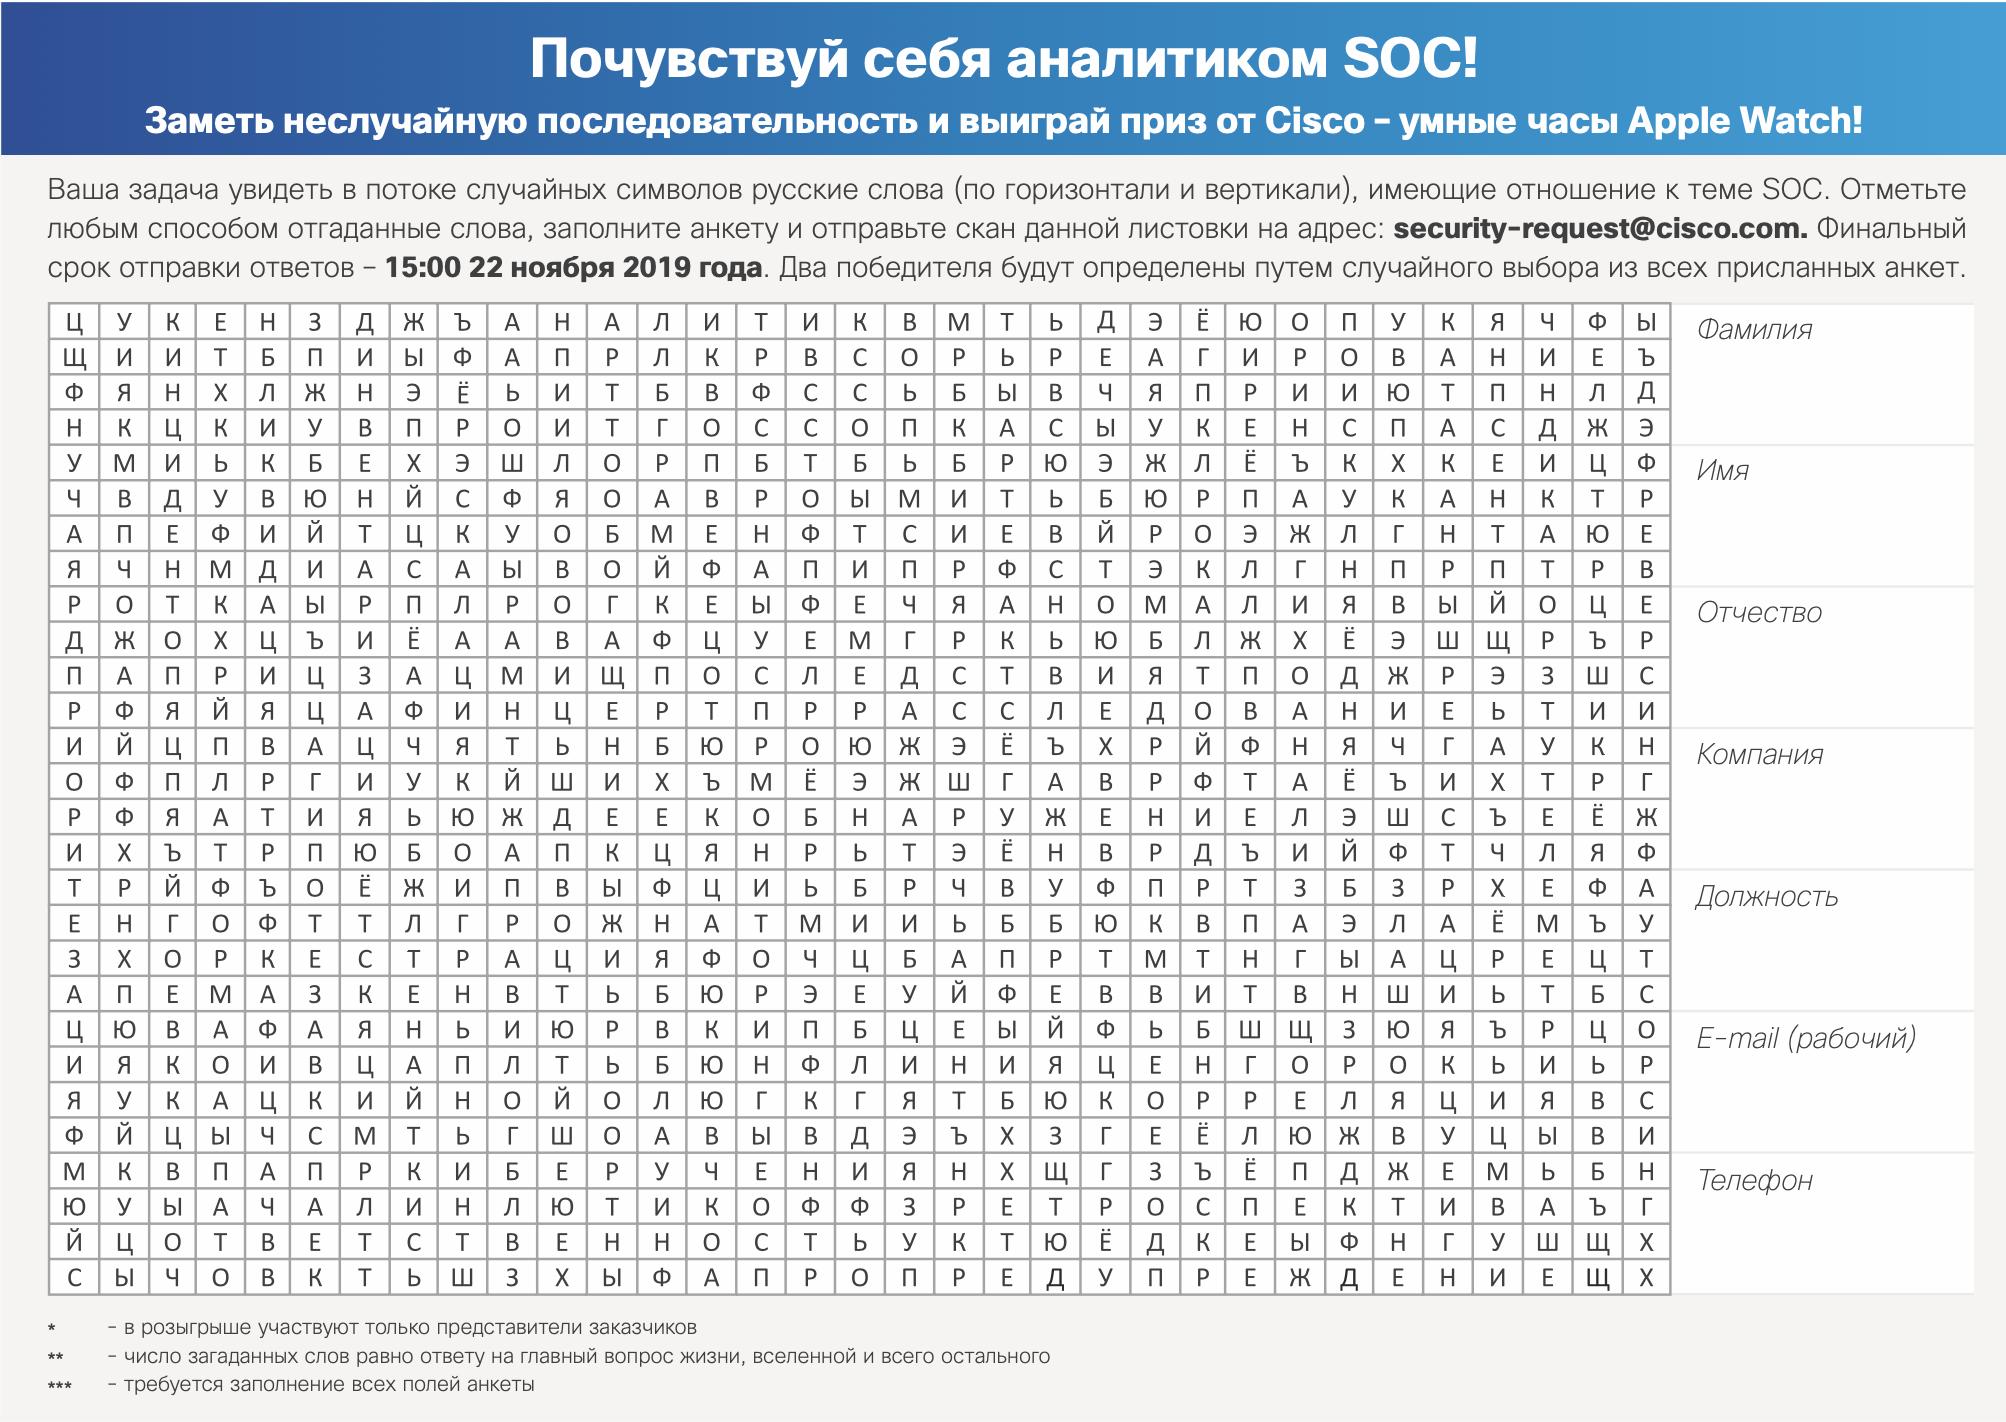 Кроссворд «Почувствуй себя аналитиком SOC»